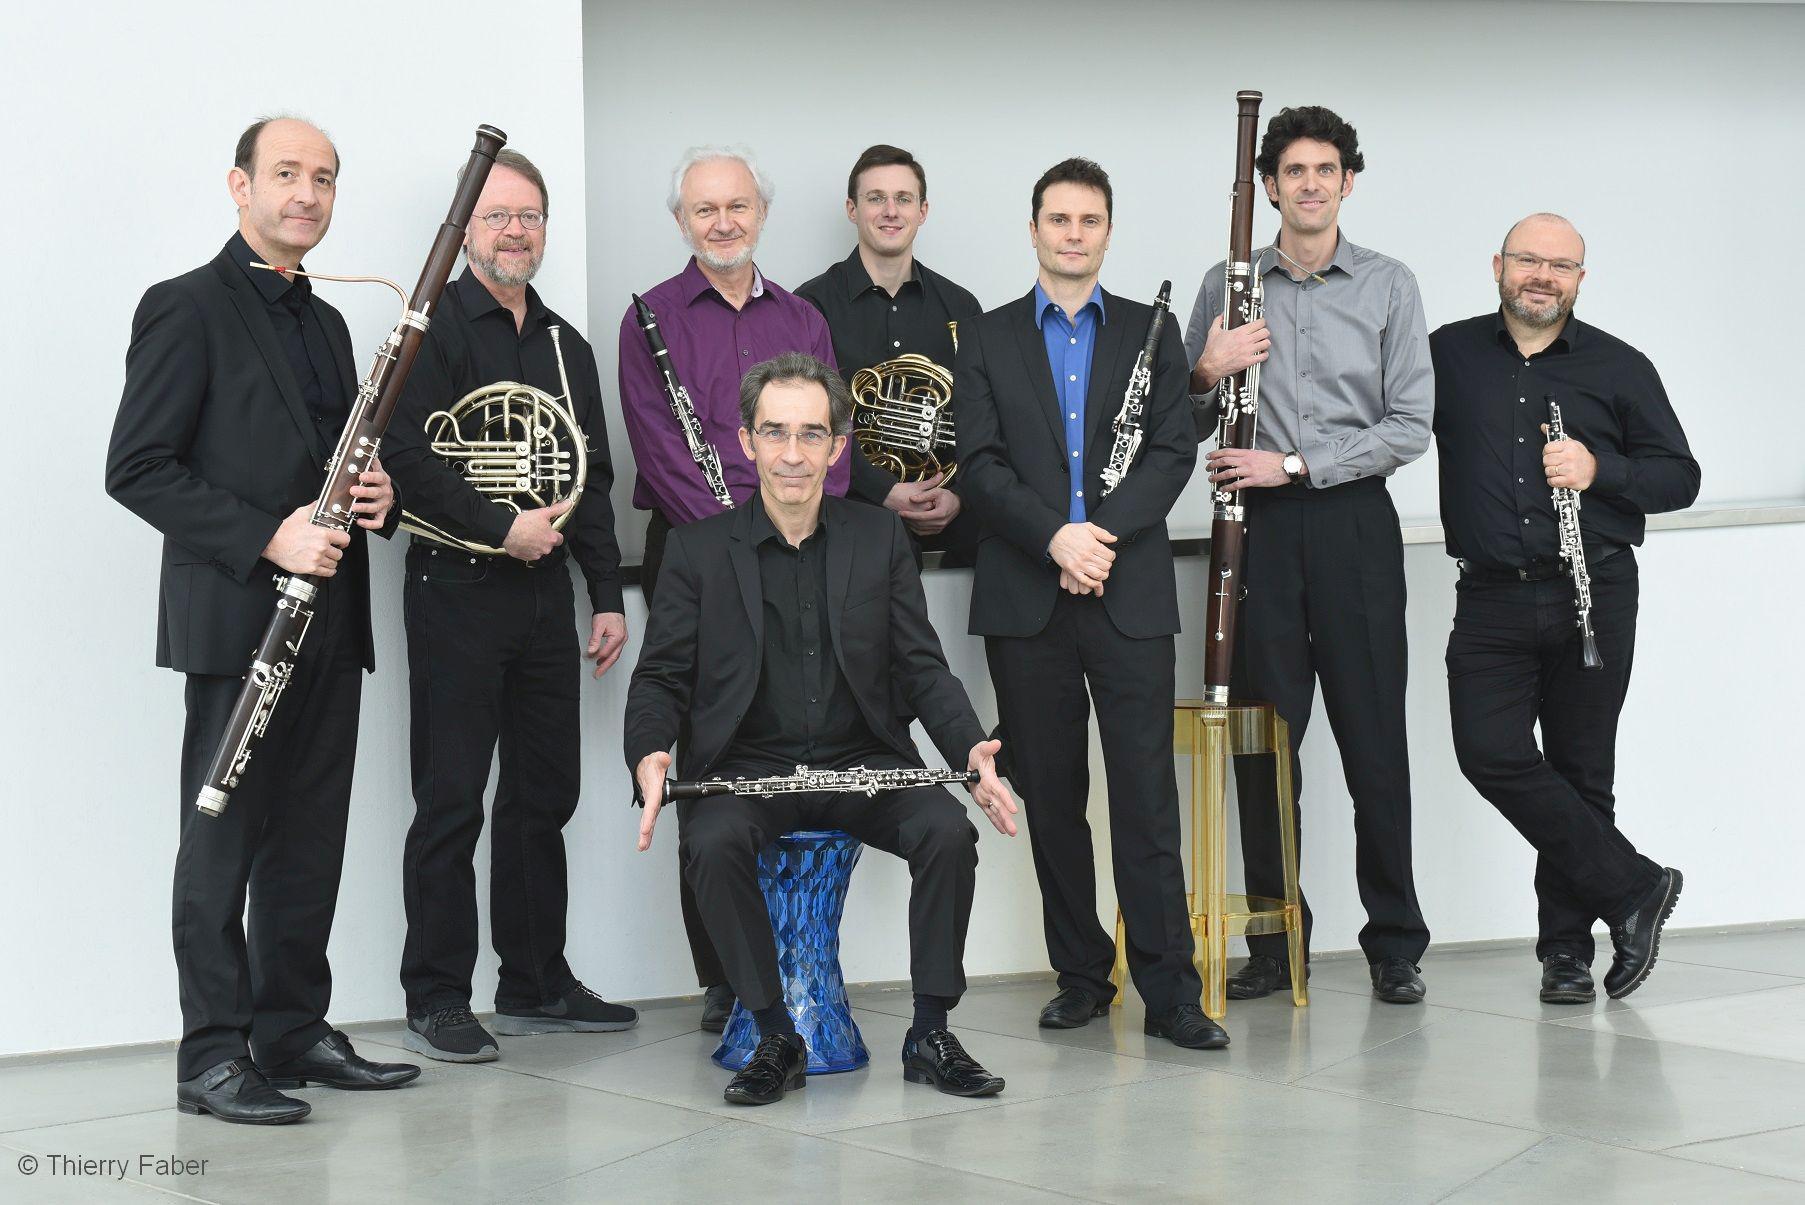 Concert-apéritif 08.10.2017 : Mélinon, Germani, Dartevelle, Chaussade, Sattler,  Baptiste, Halsdorf, Olson